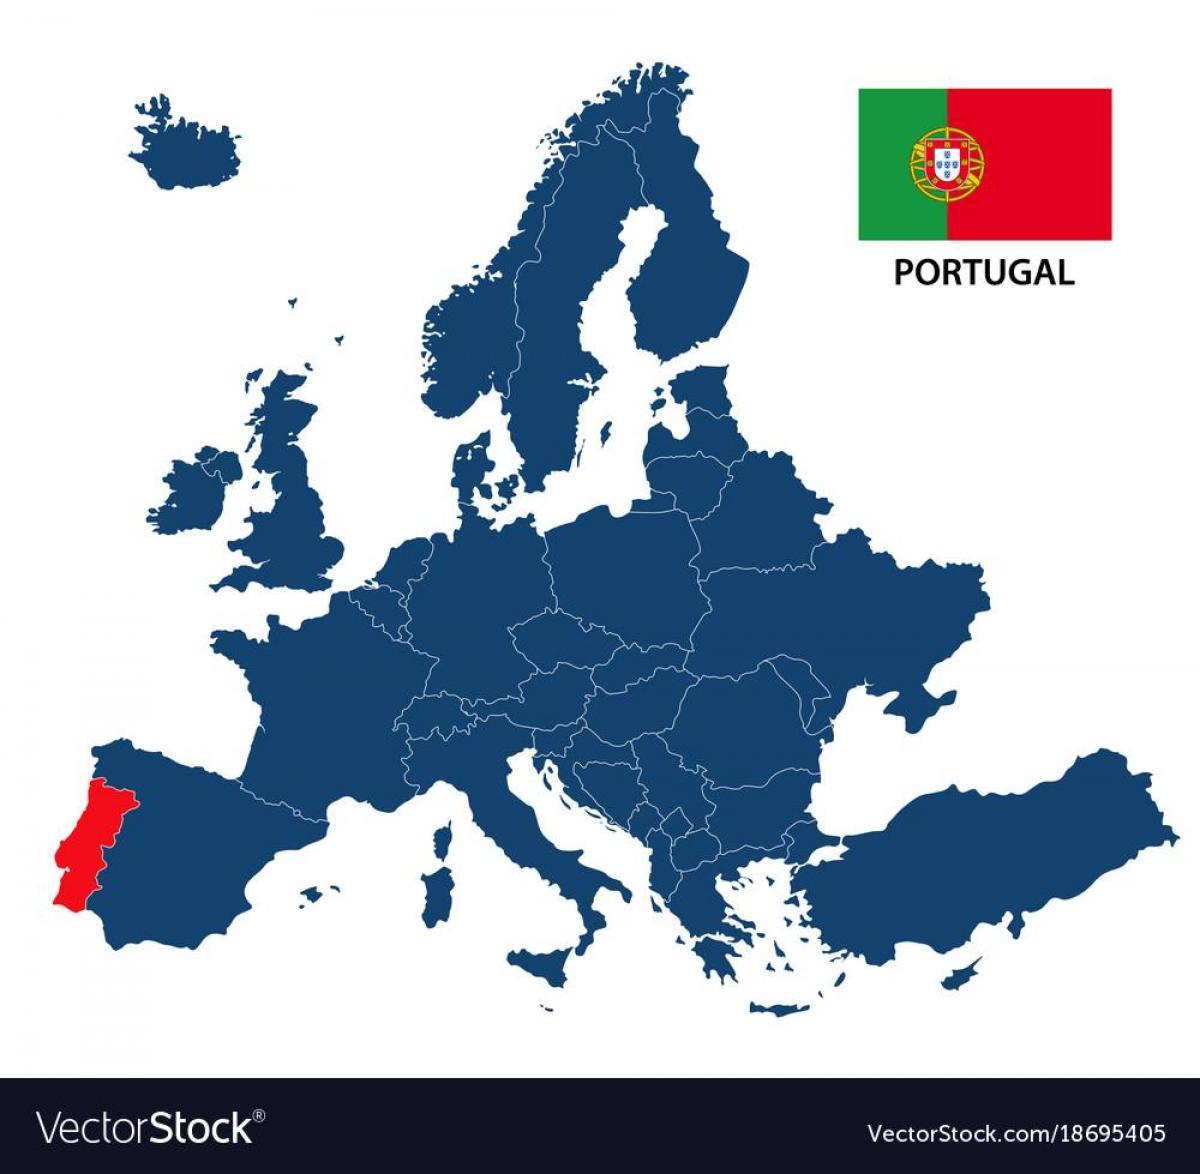 södra europa karta Europa karta Portugal   Karta över Portugal i Europa (Södra Europa  södra europa karta